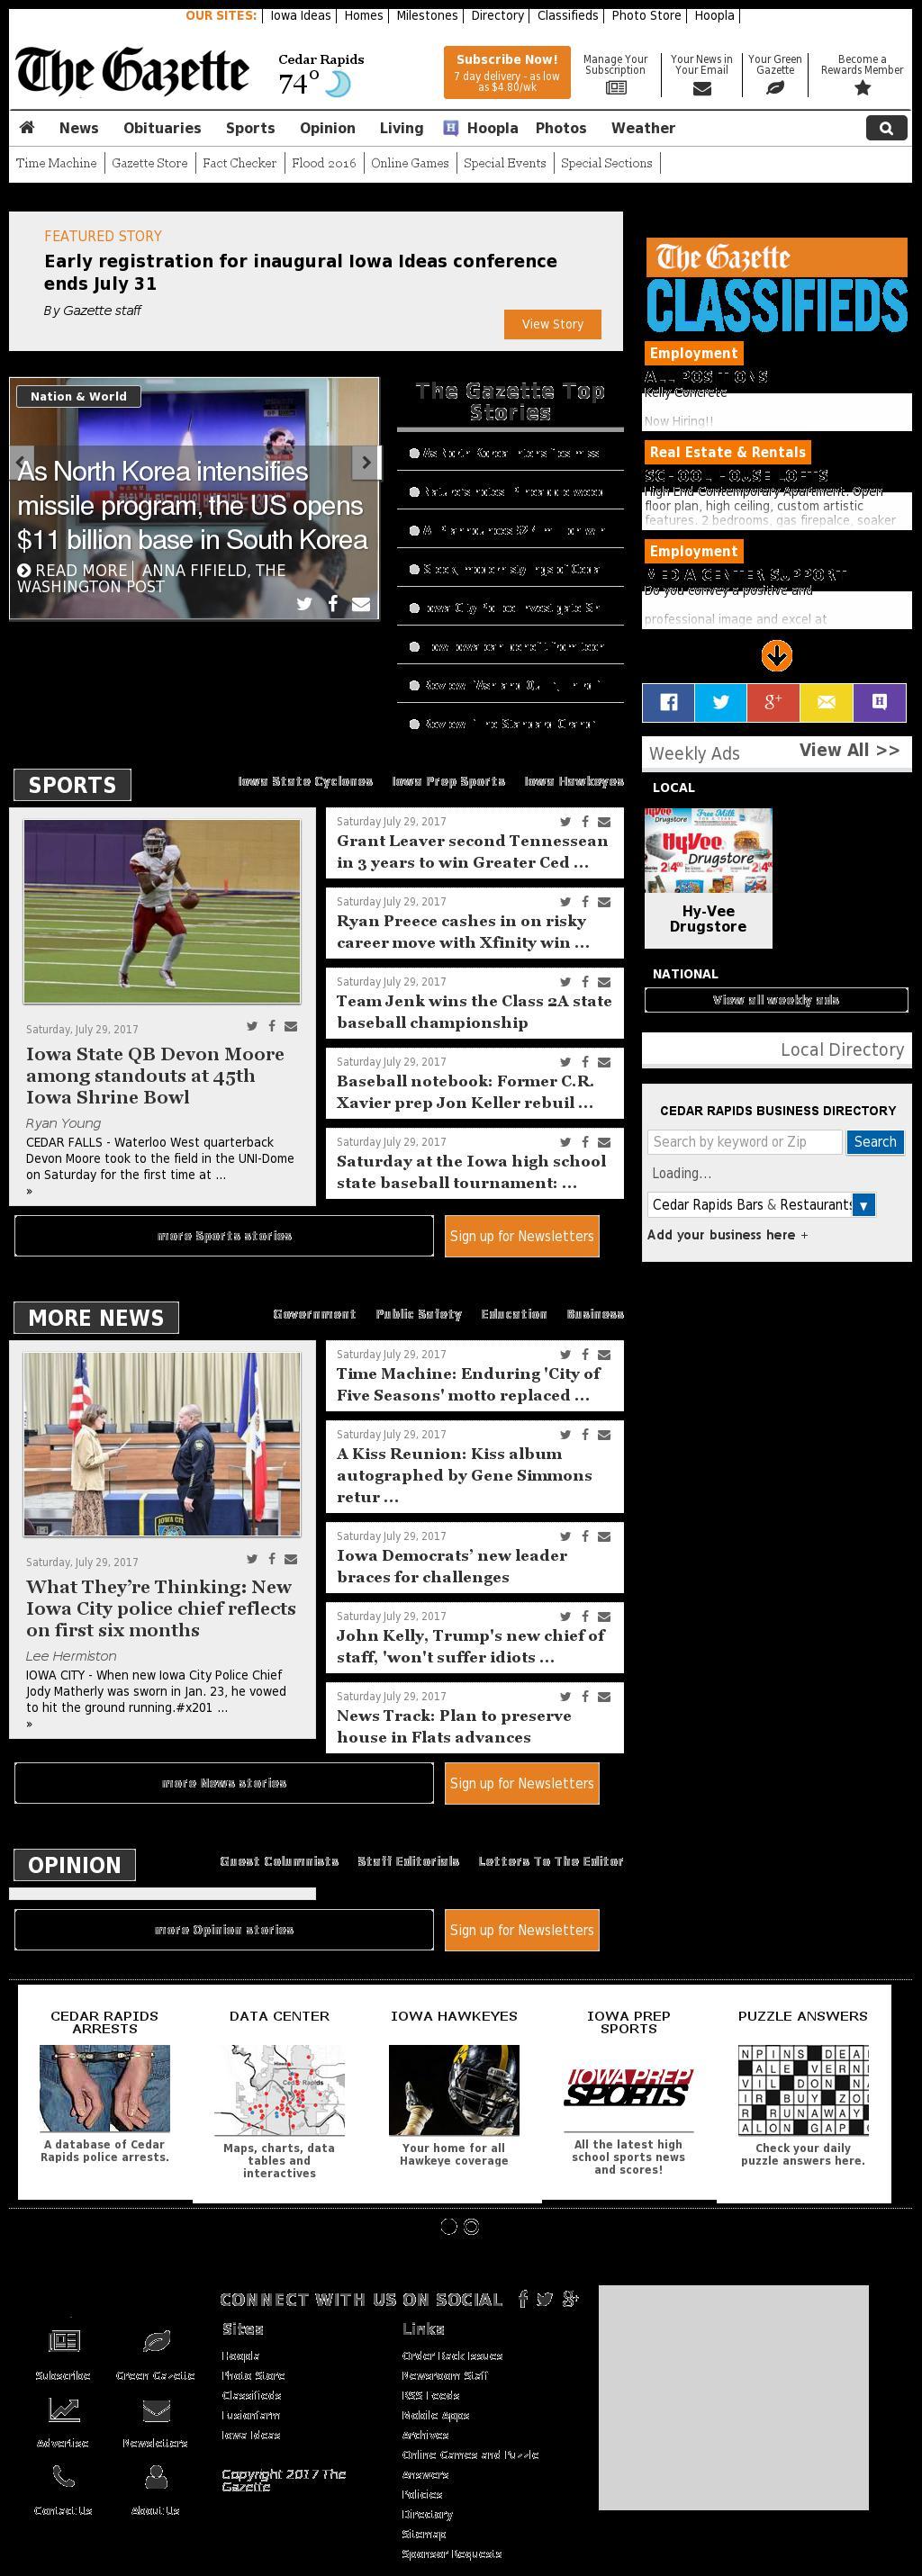 The (Cedar Rapids) Gazette at Sunday July 30, 2017, 2:06 a.m. UTC